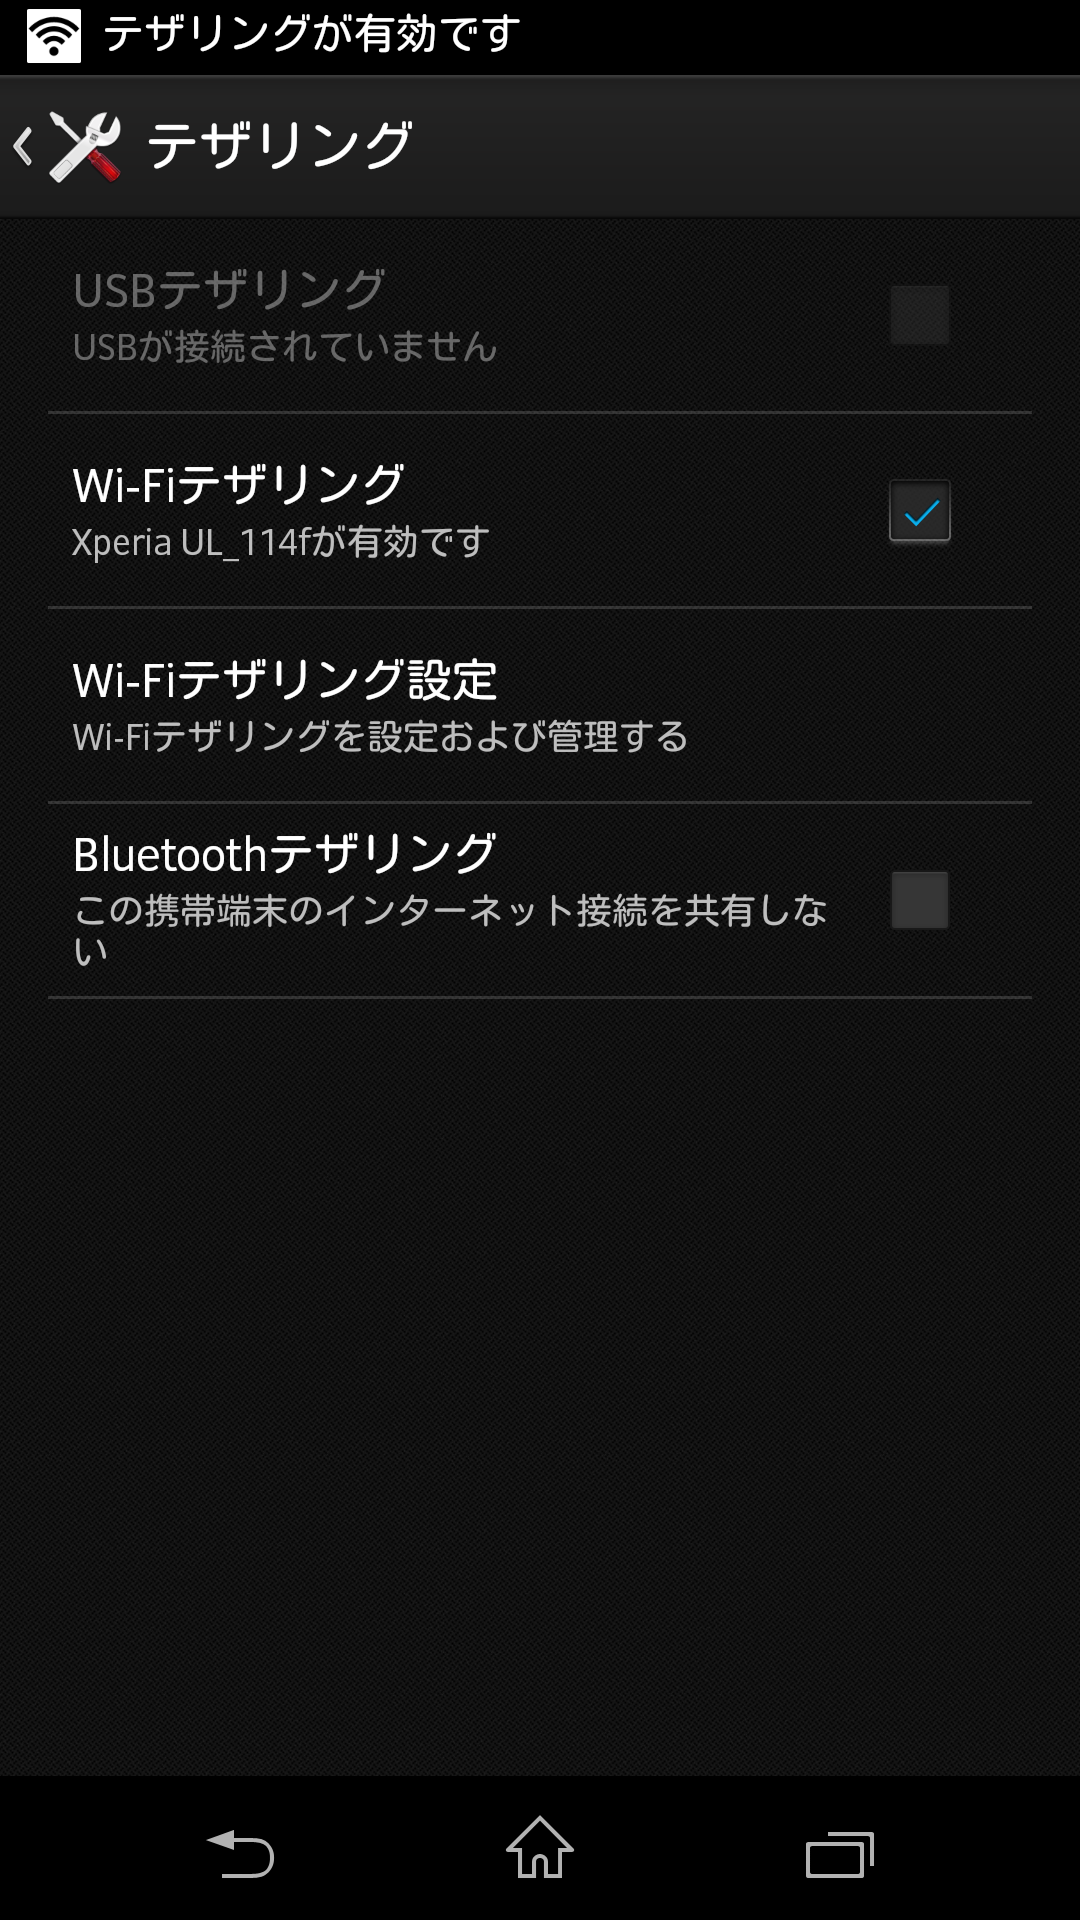 Screenshot_2013-10-06-01-27-48